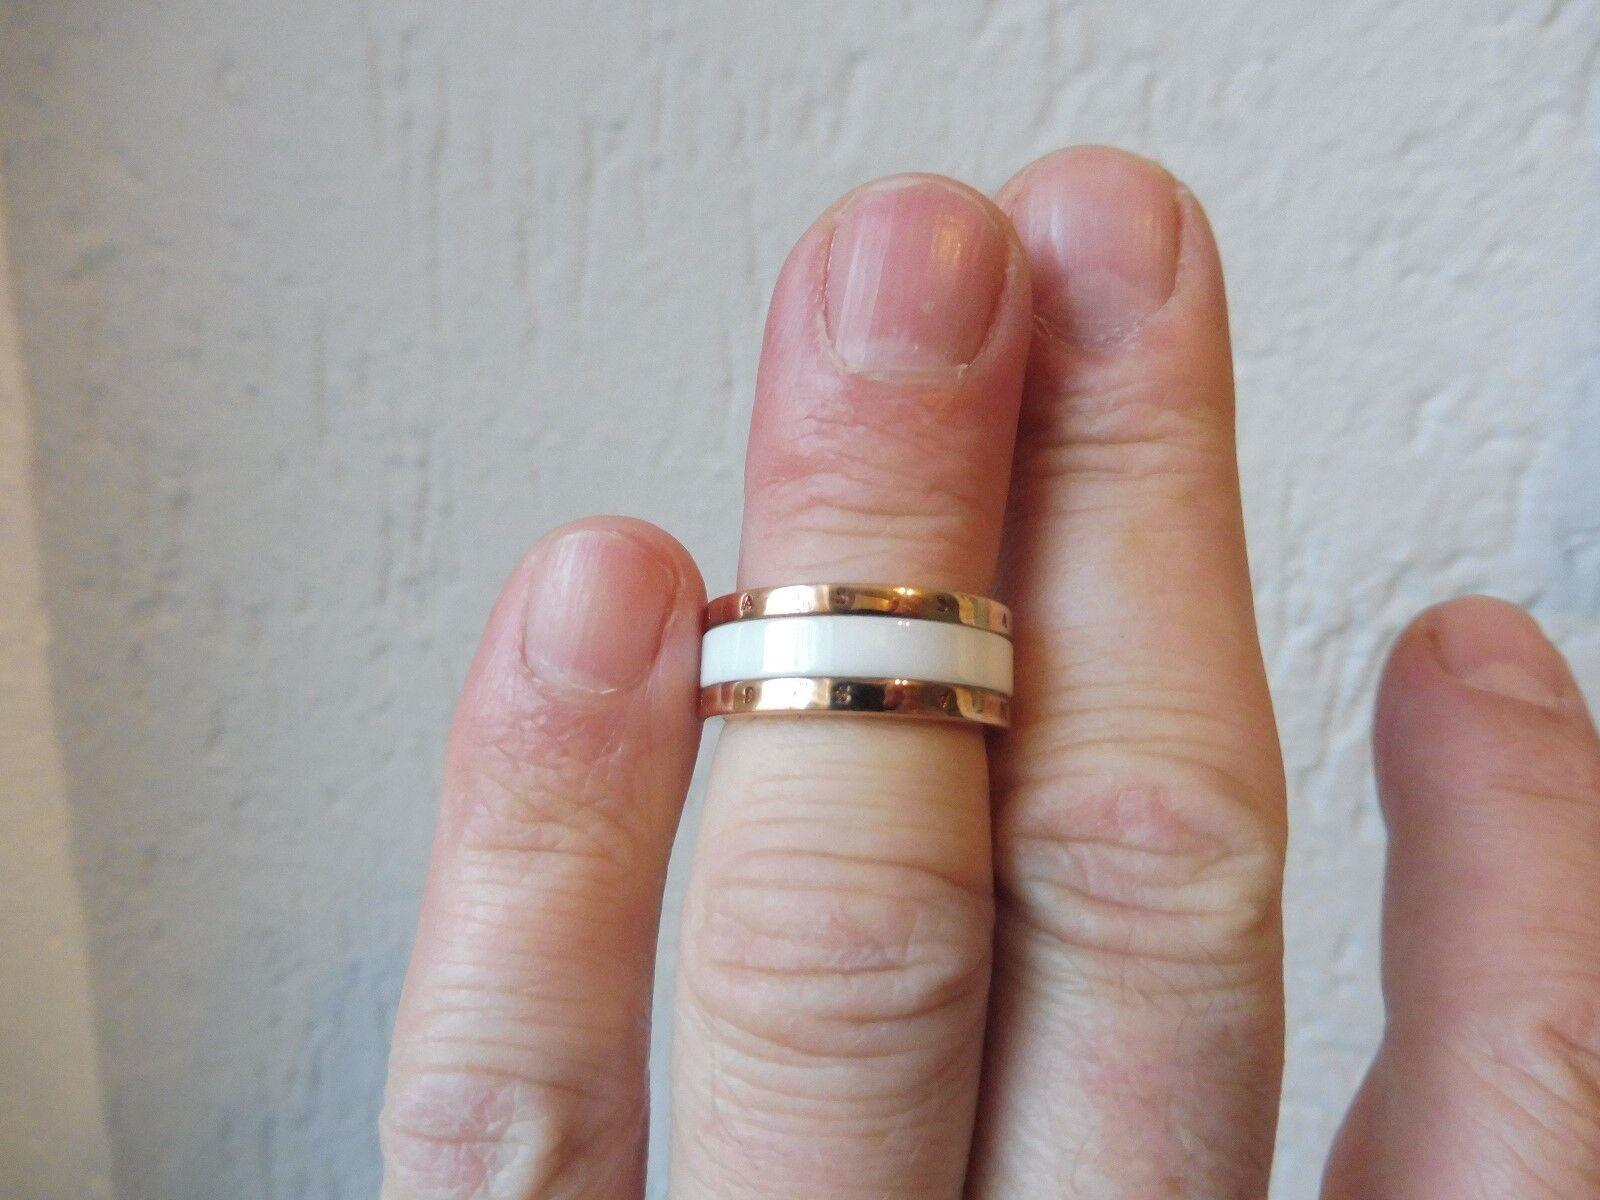 Schöner Ring__925 silver vergoldet __Thomas Sabo__Sabo-Preis